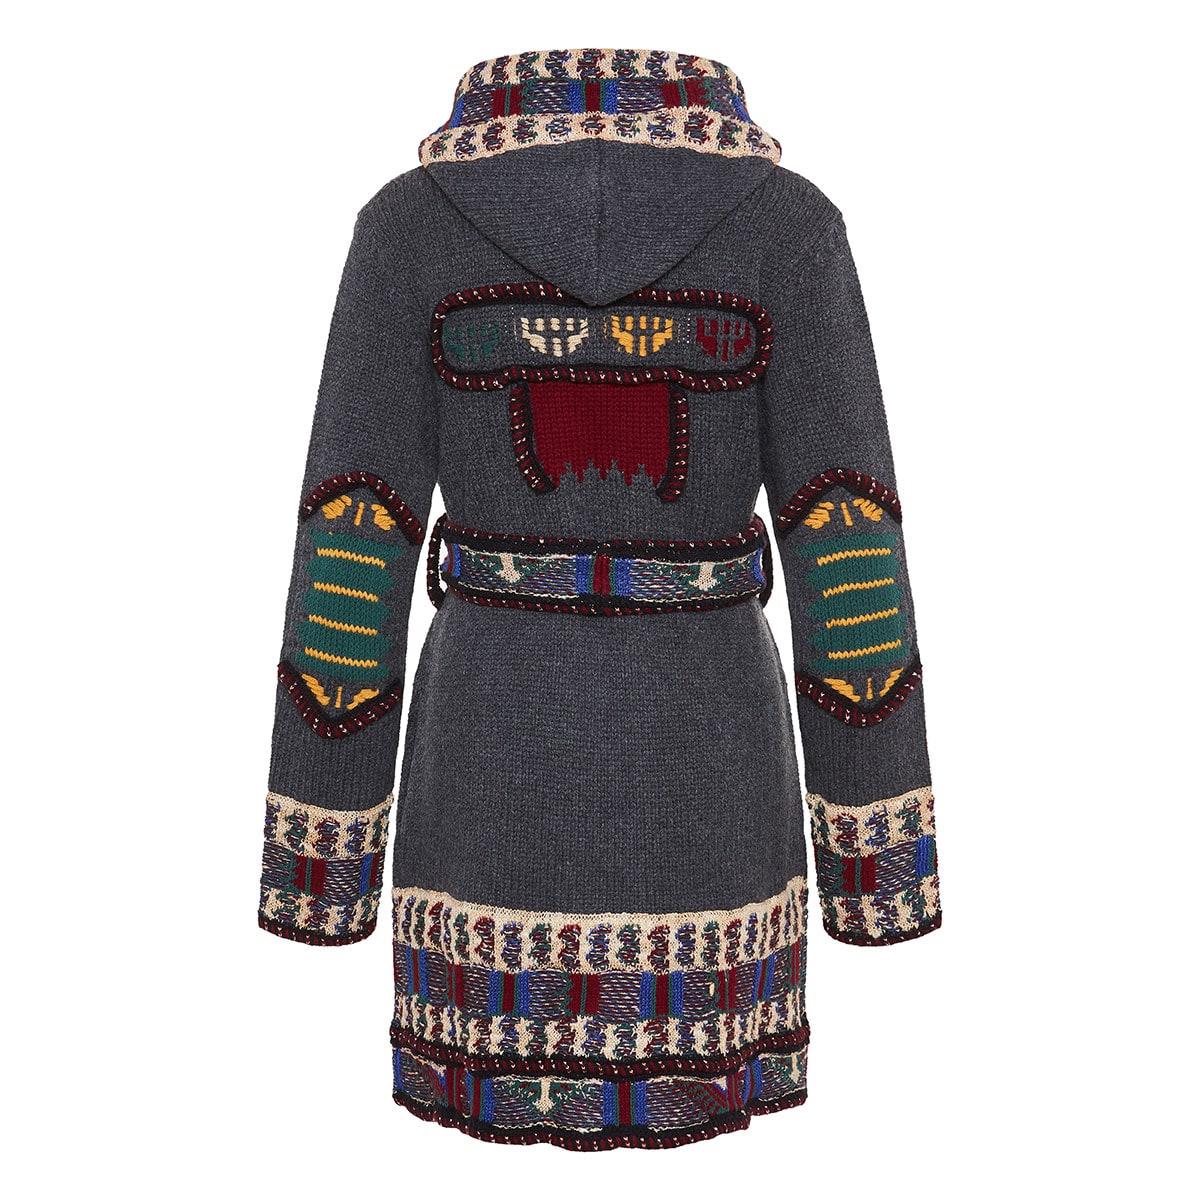 Jacquard hooded cardigan